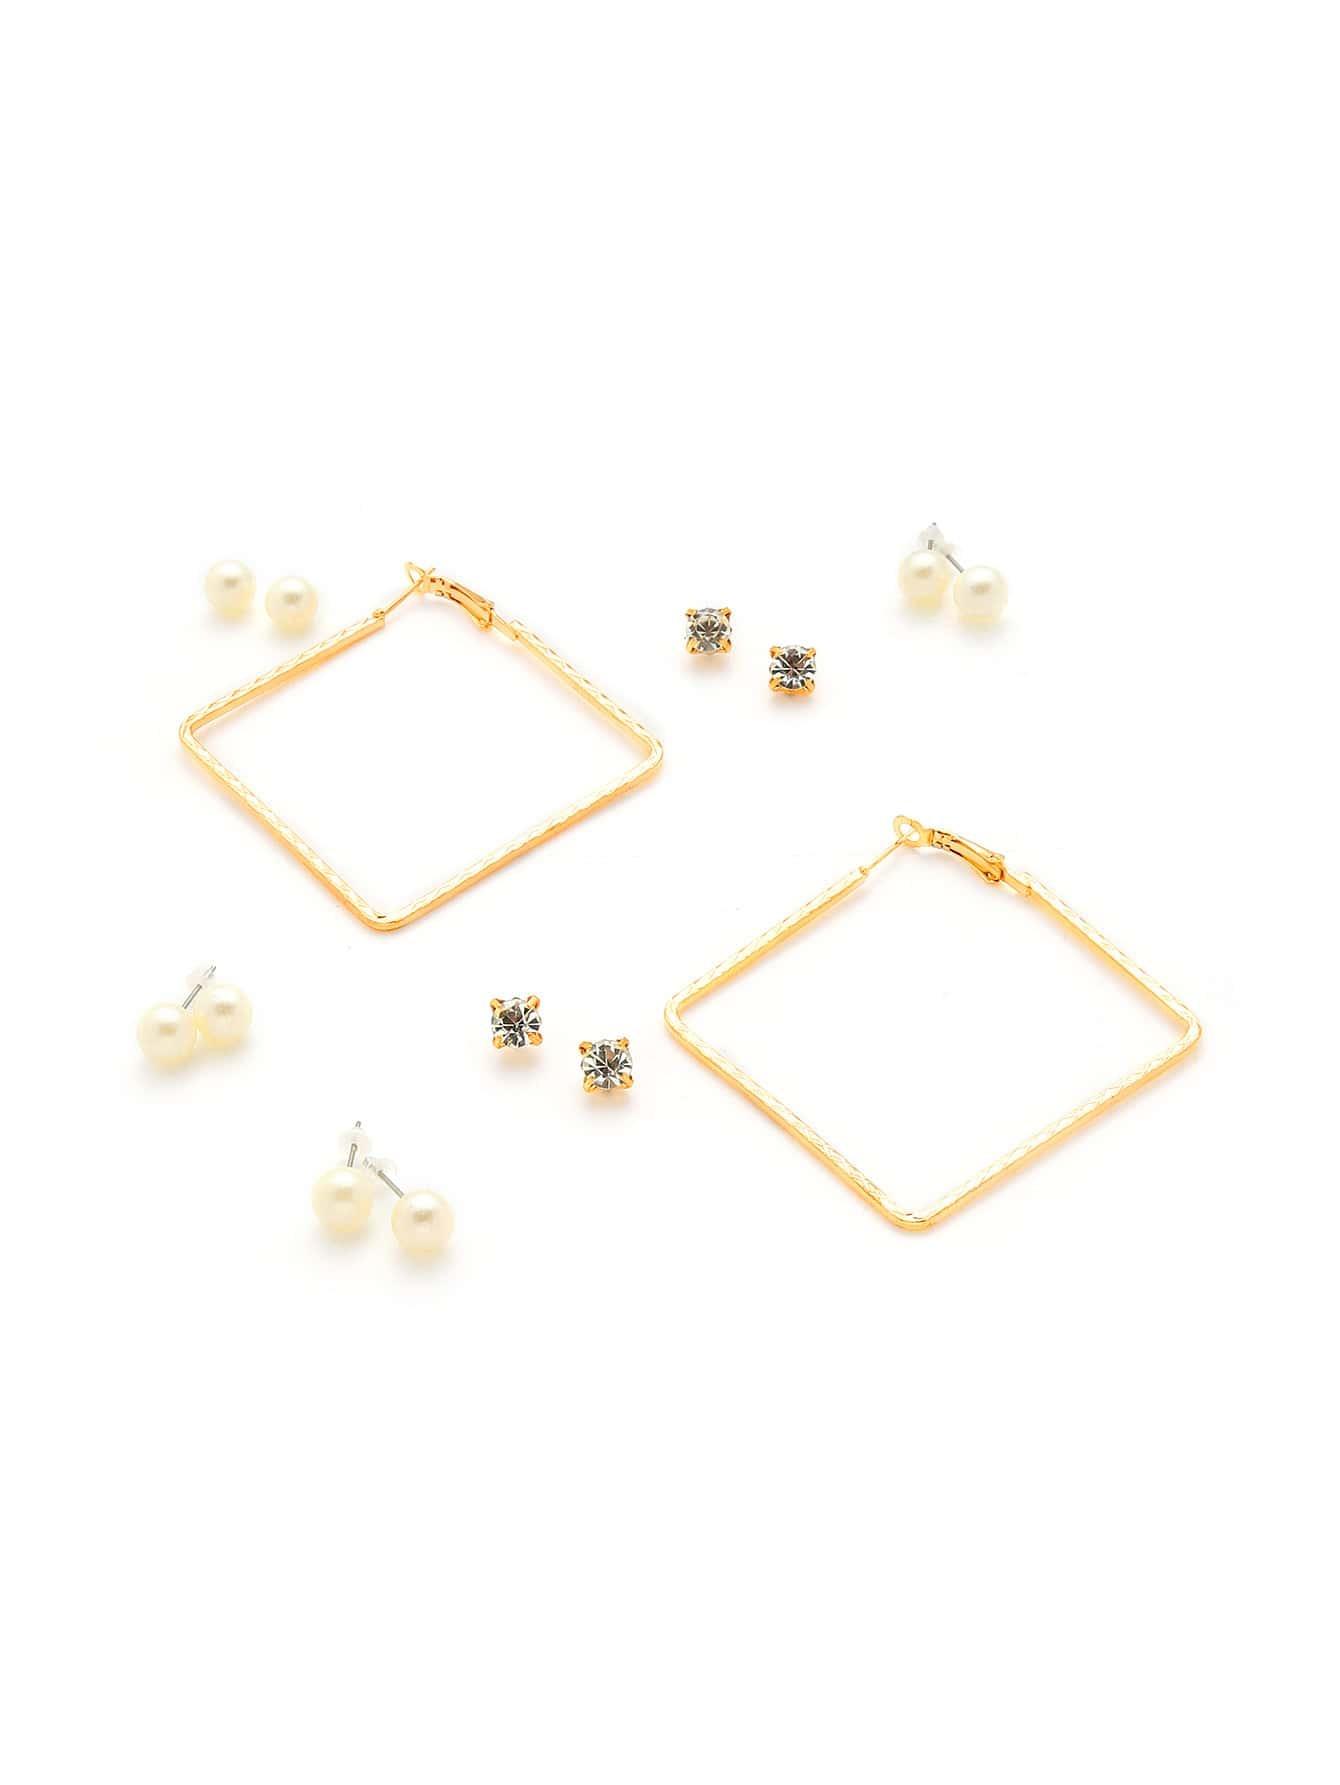 Faux Pearl & Rhinestone Design Earring Set